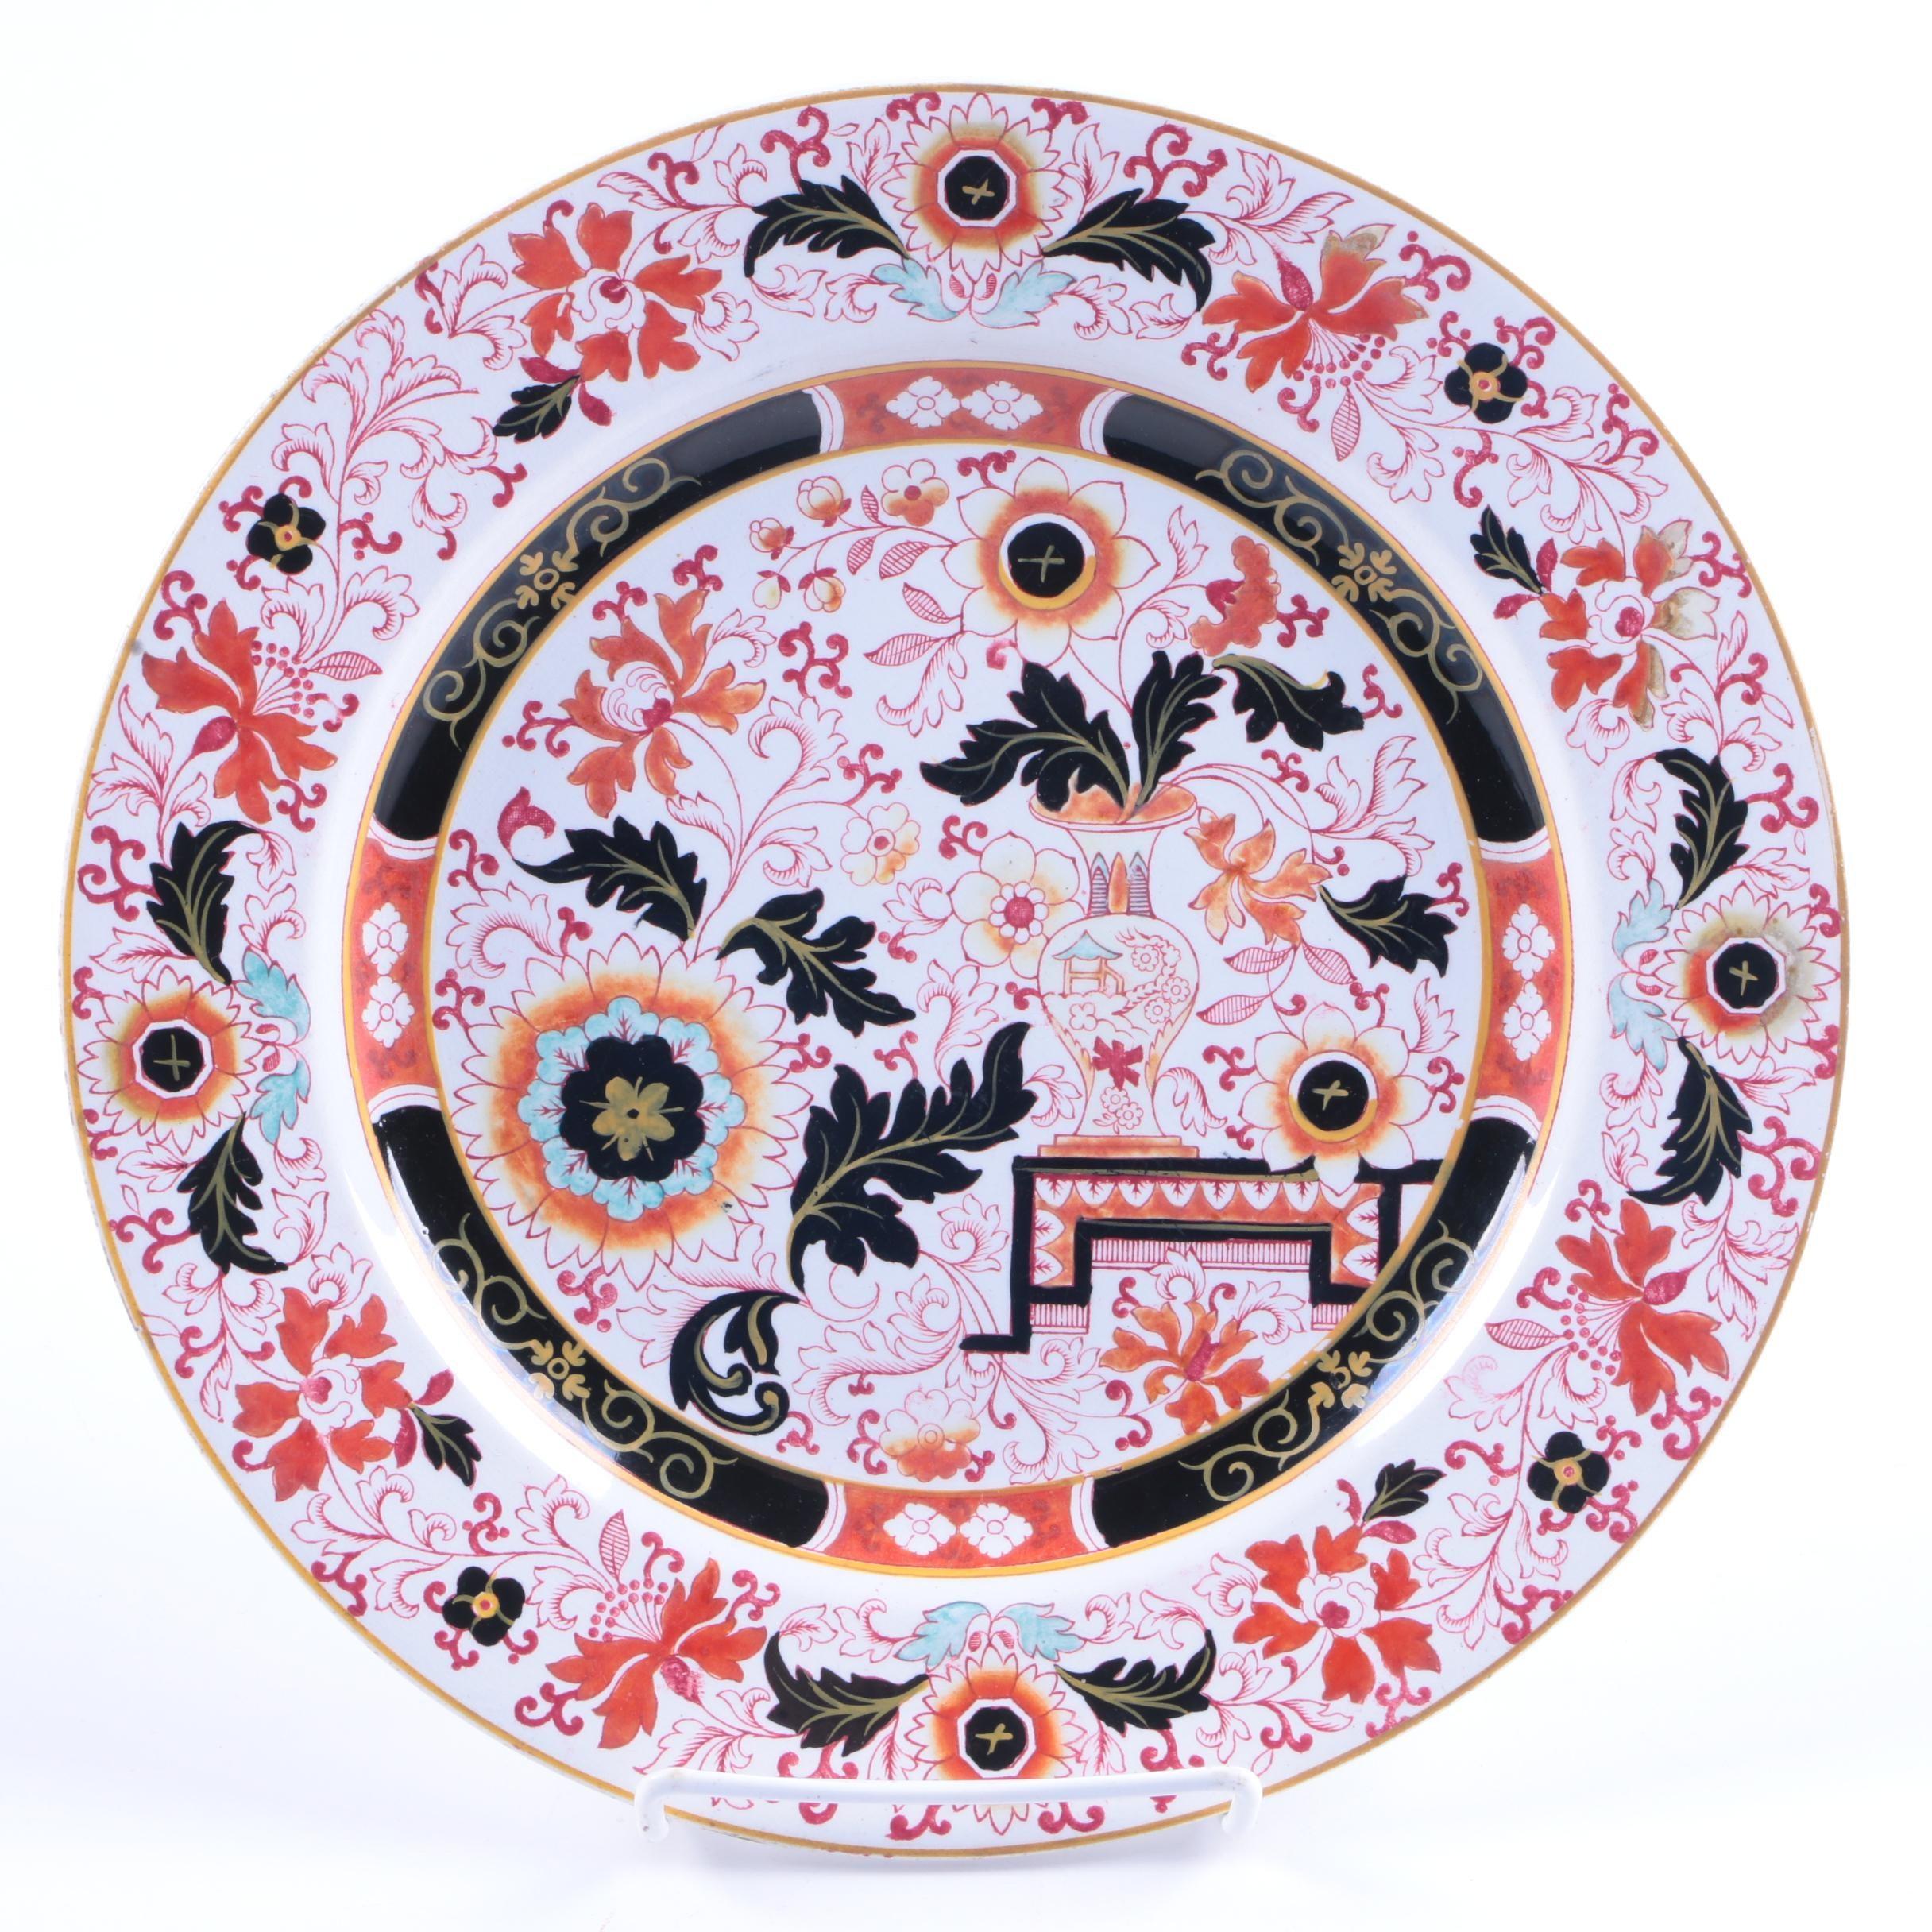 Antique Ashworth Brothers Imari Plate ...  sc 1 st  EBTH.com & Antique Ashworth Brothers Imari Plate : EBTH